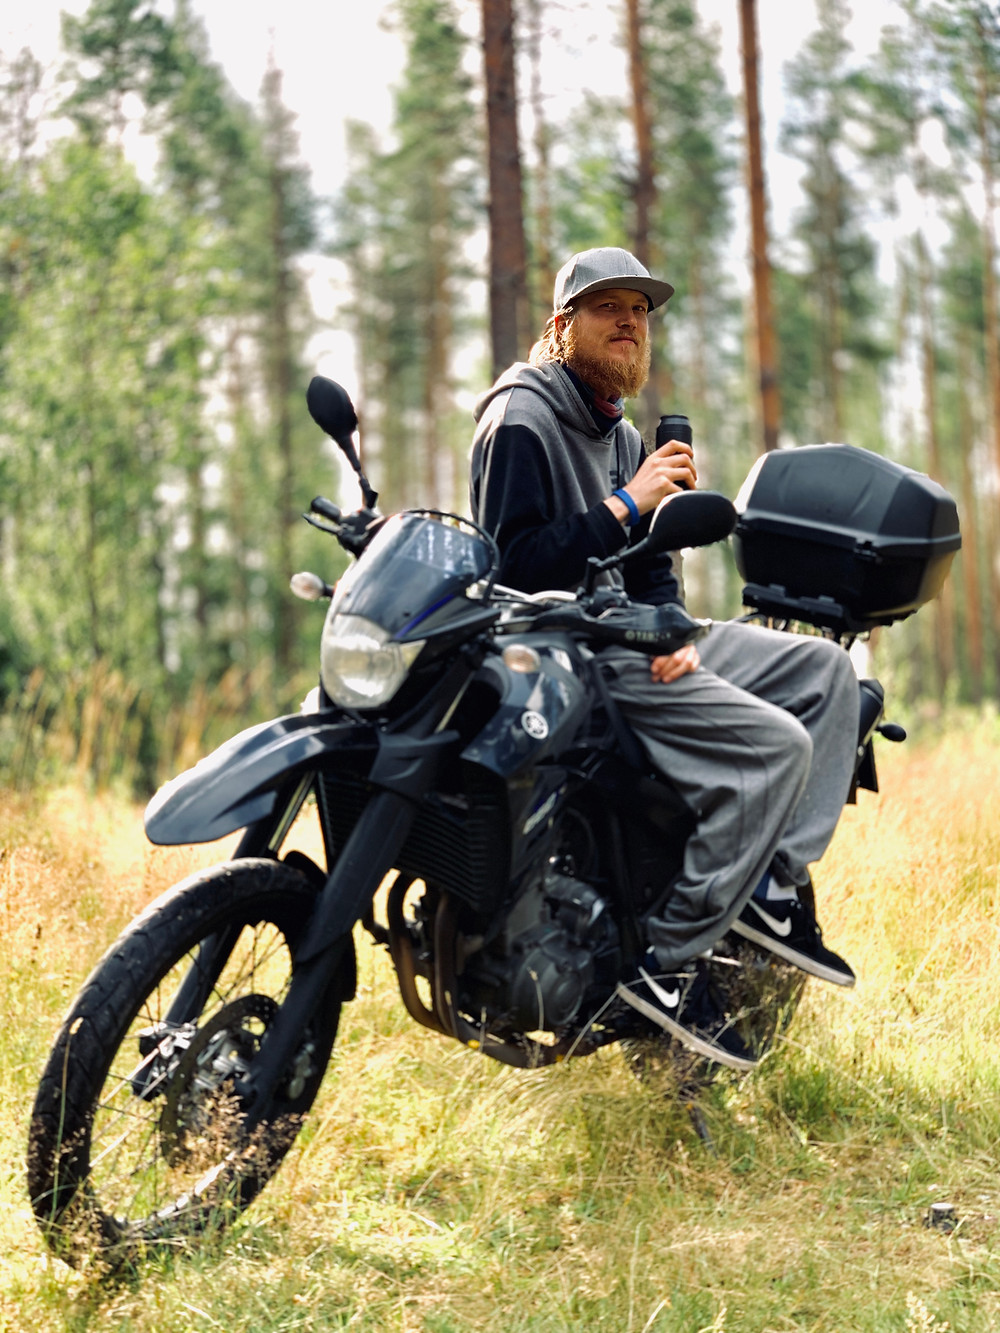 Ride the Bean | Kenneth | Yamaha XT660 | Sweden |